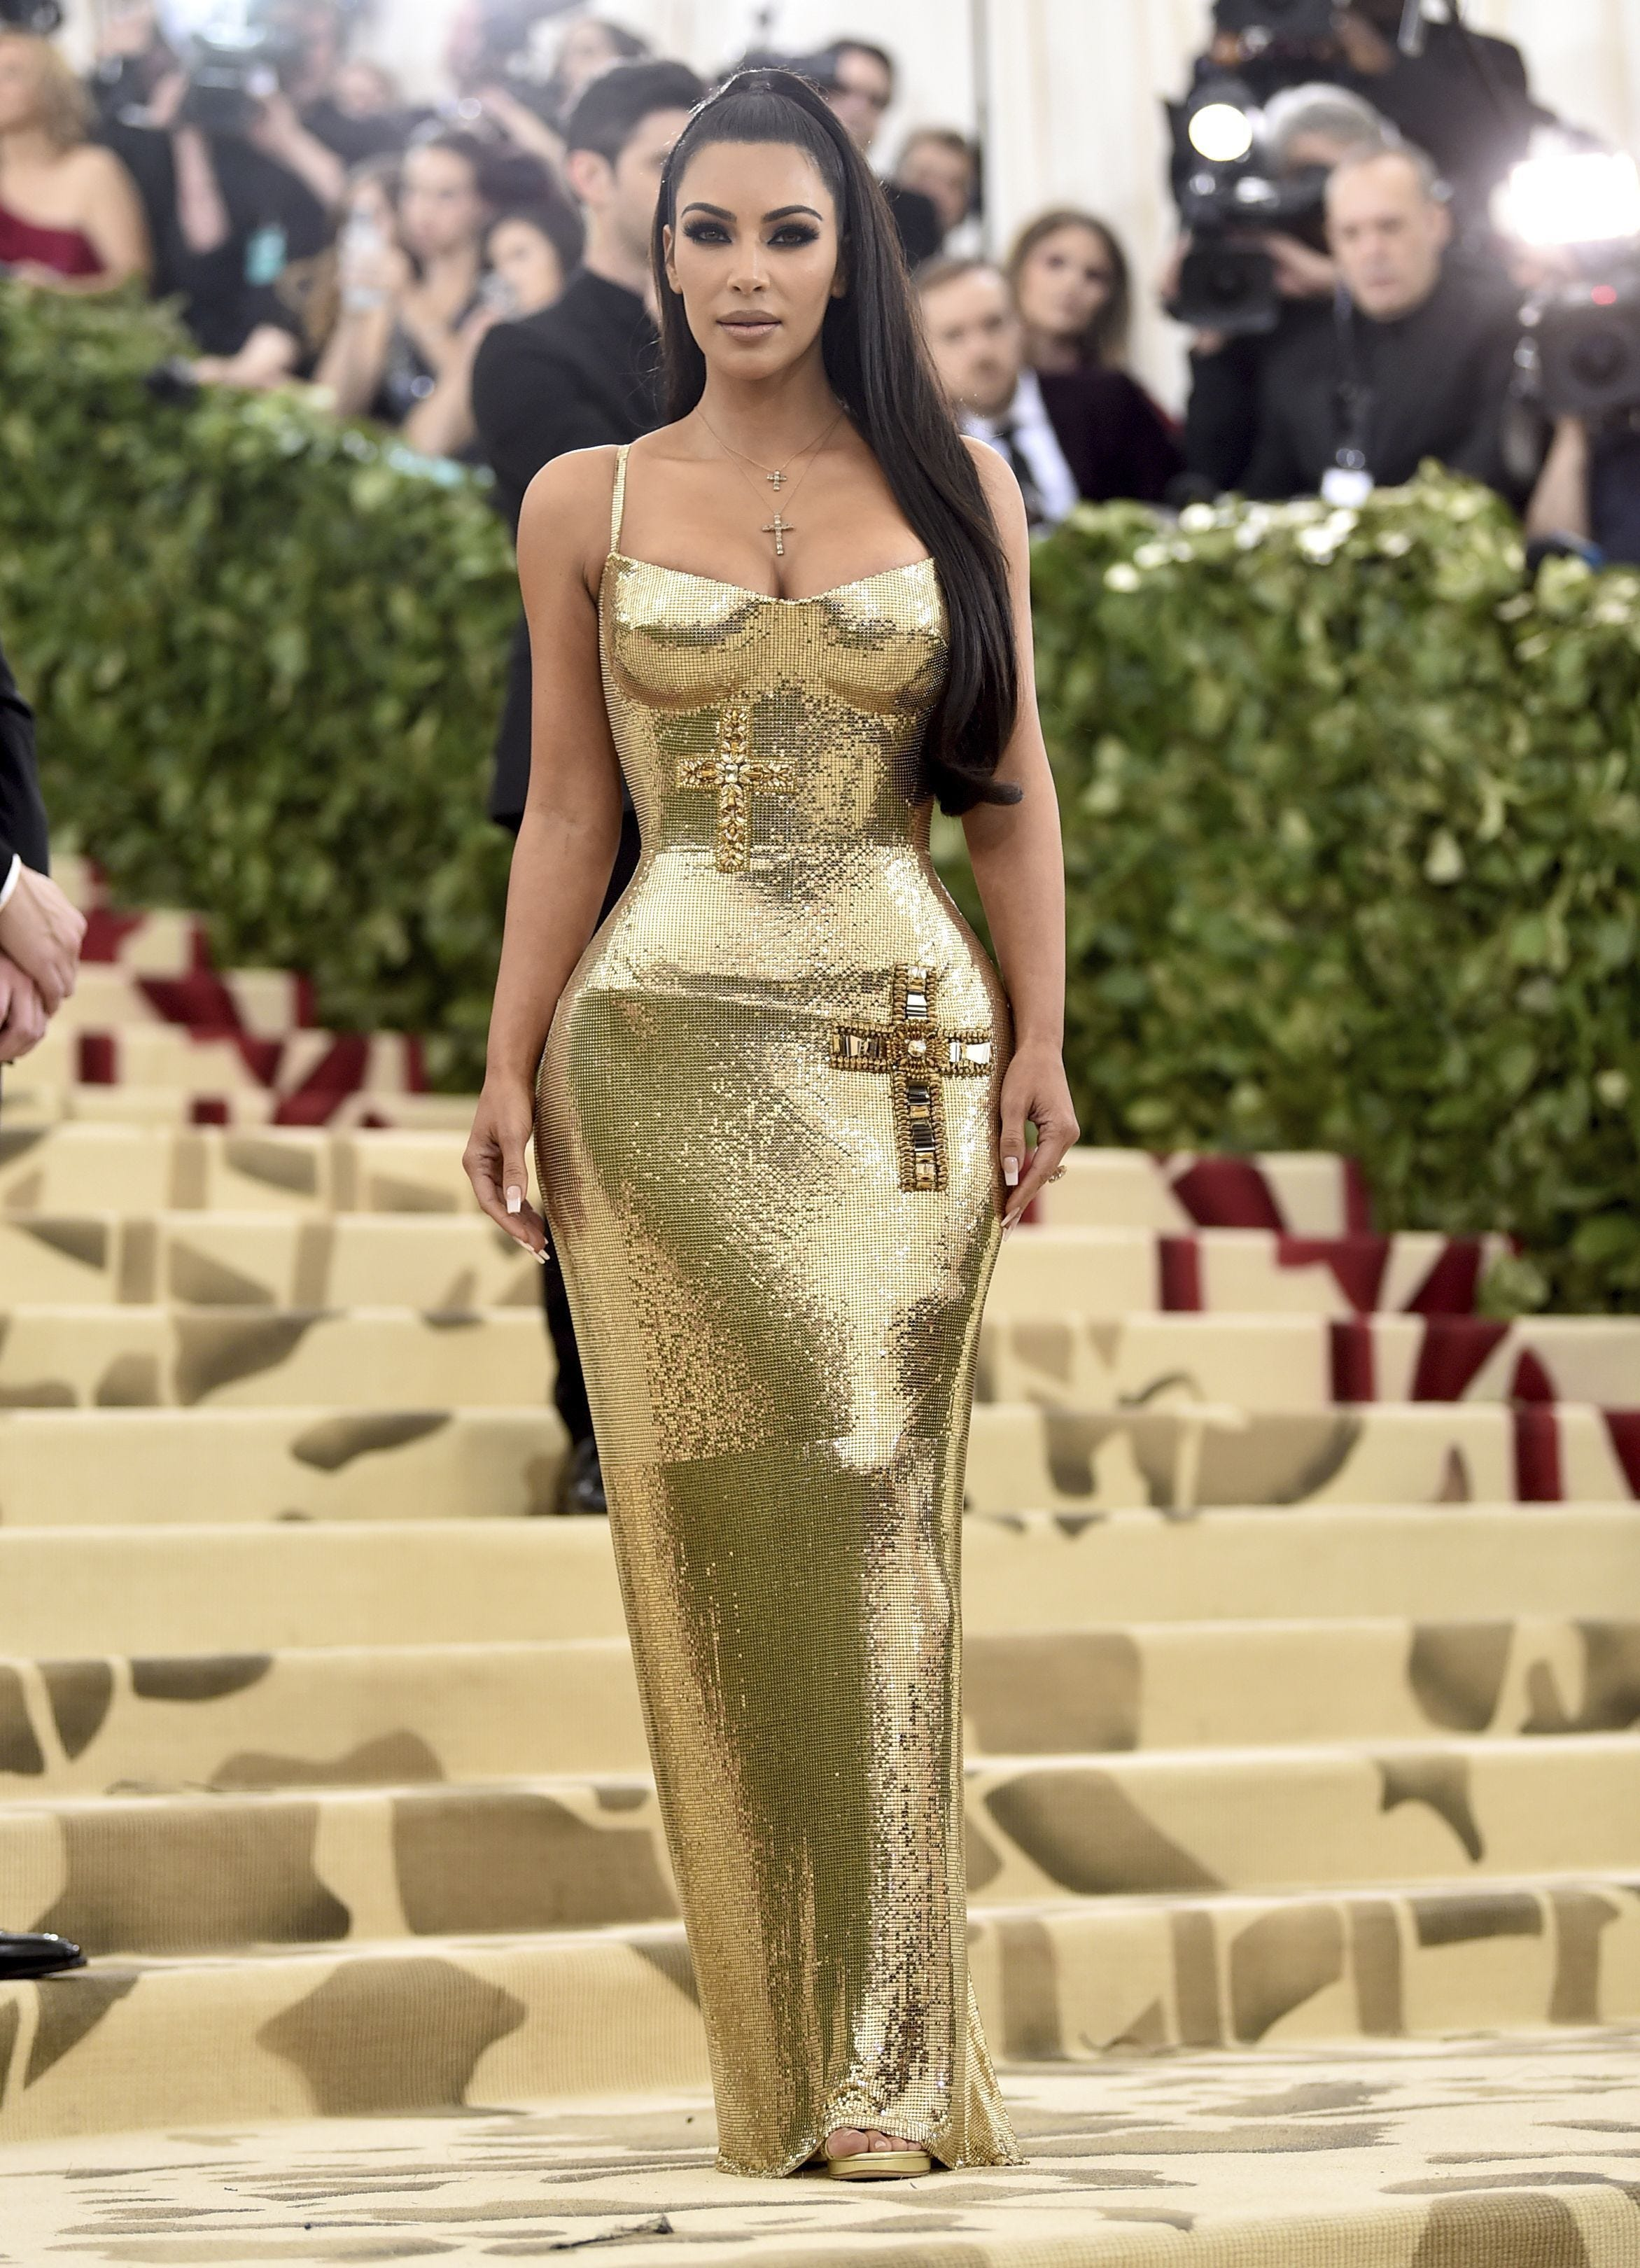 Instagram 'mistakenly' deleted Kim Kardashian West post touting appetite suppressant